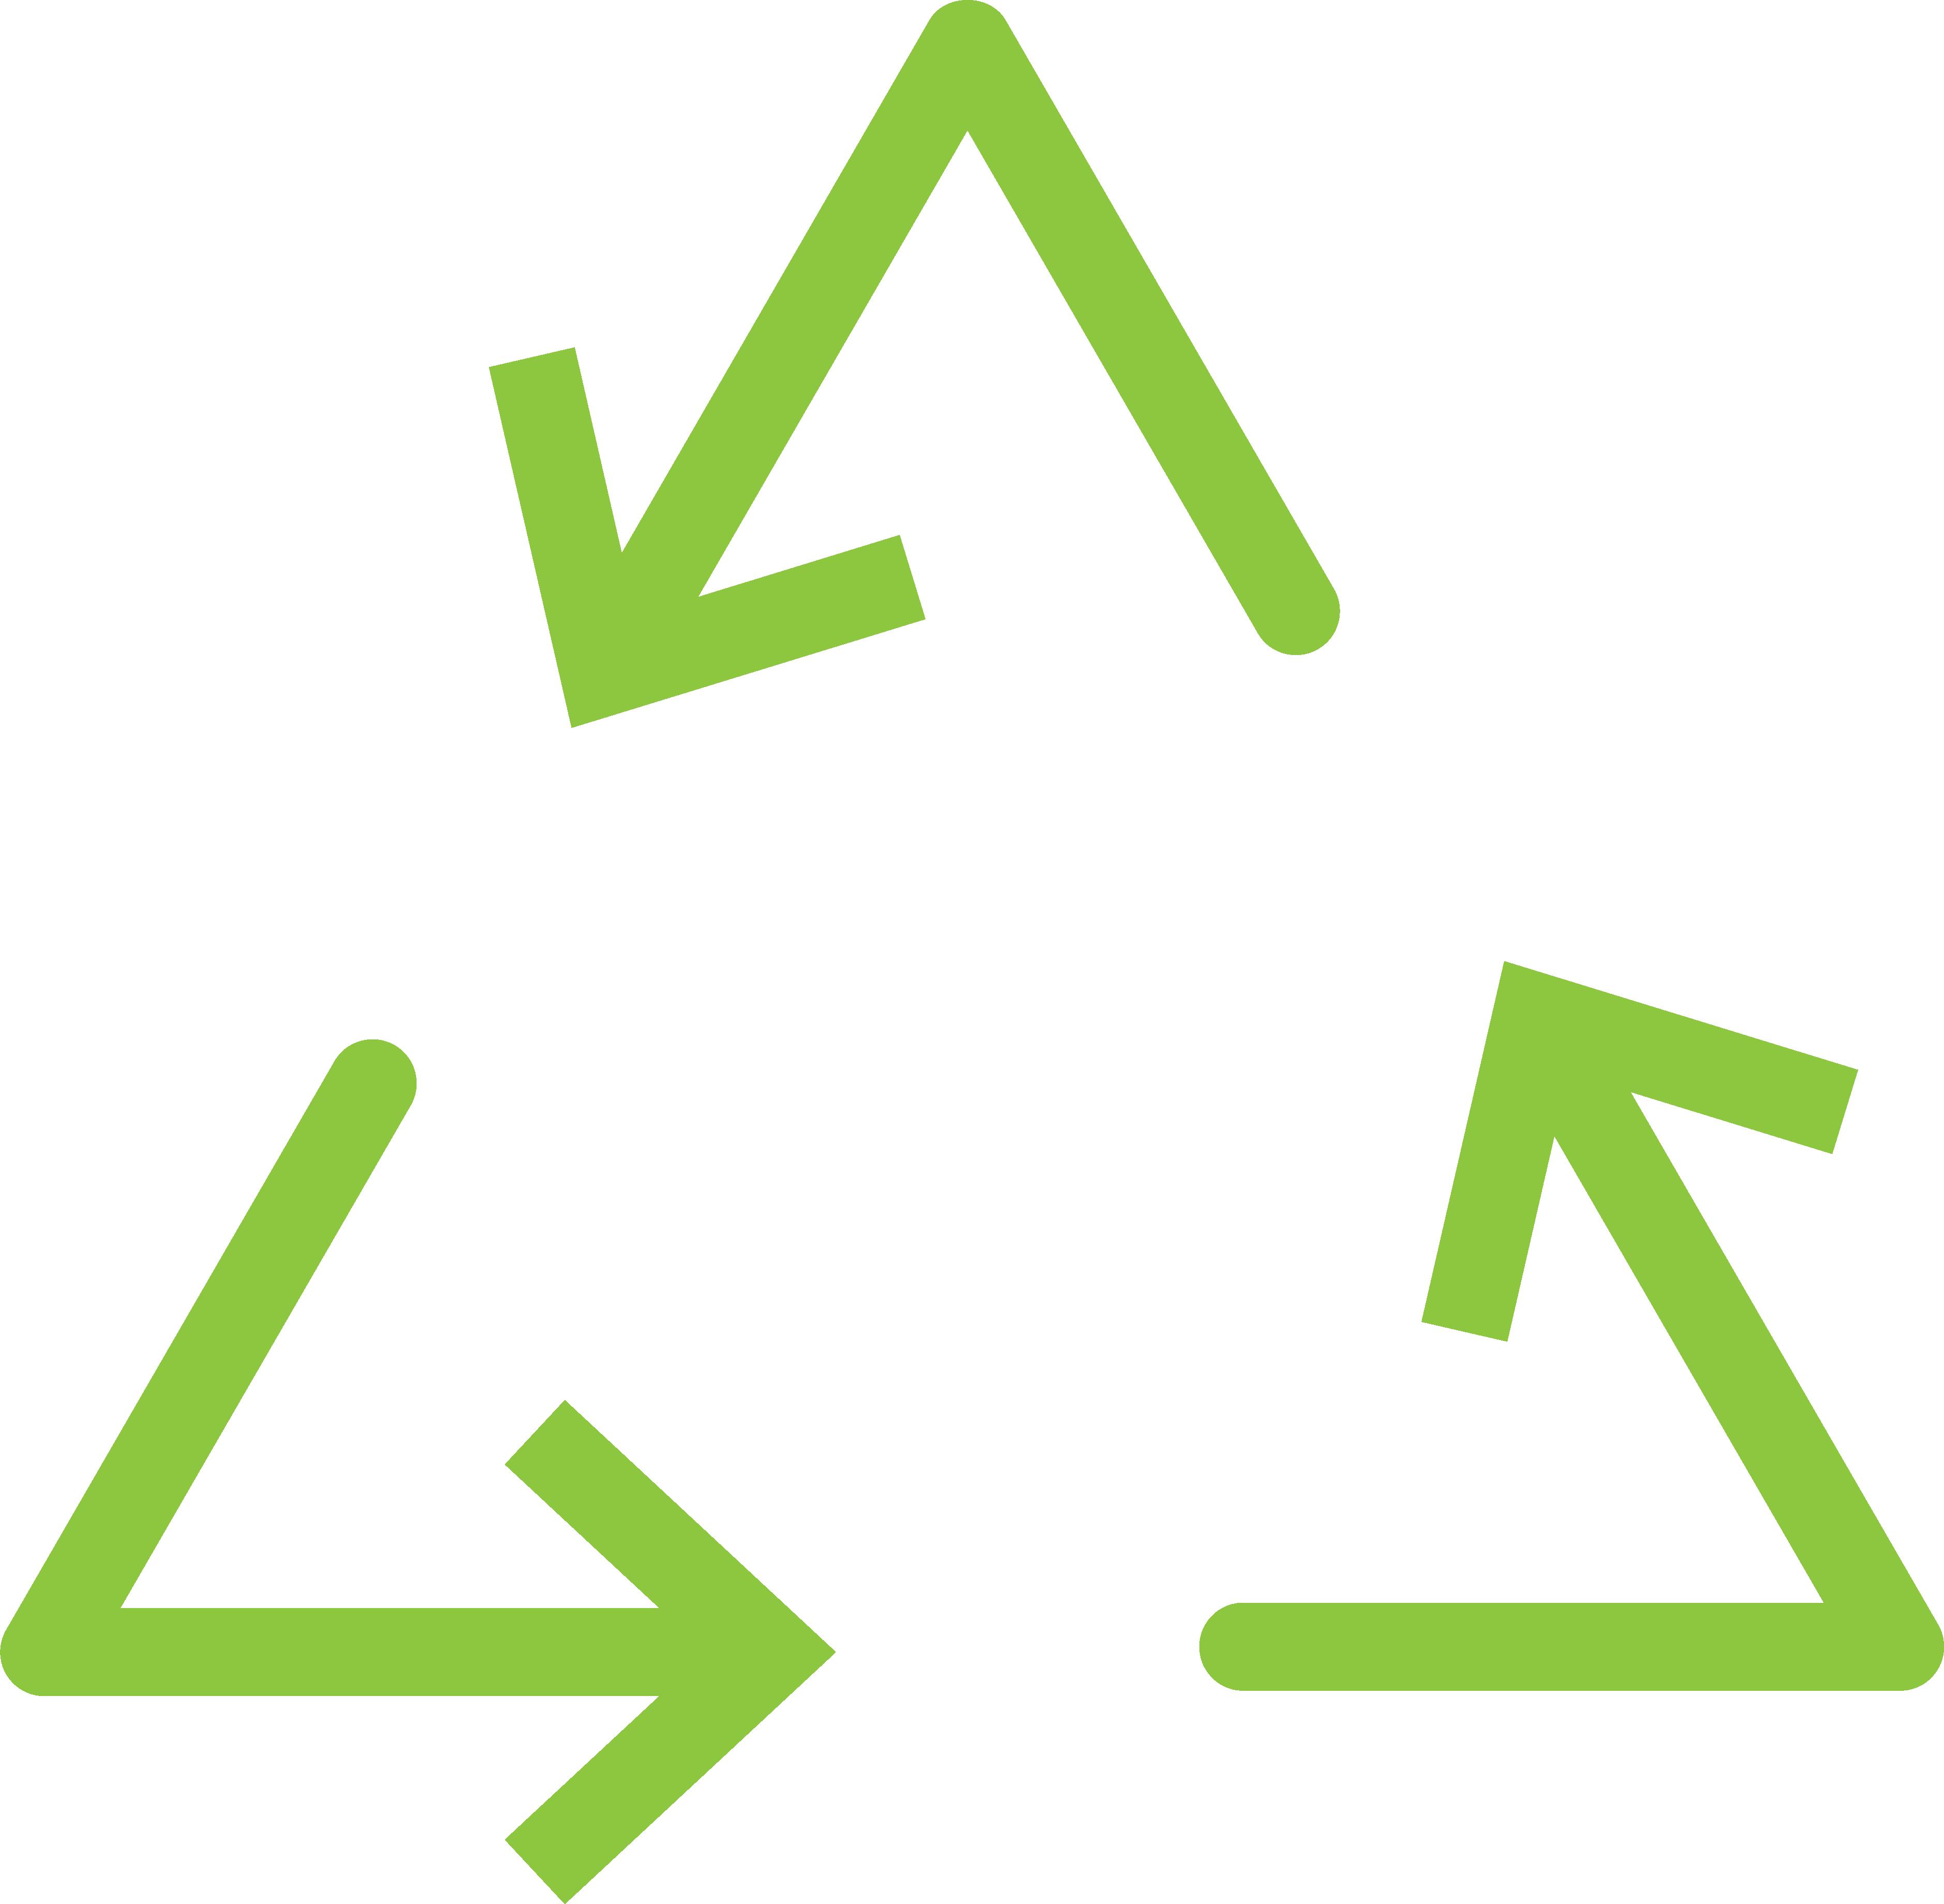 Begeleide eco-effectiviteit